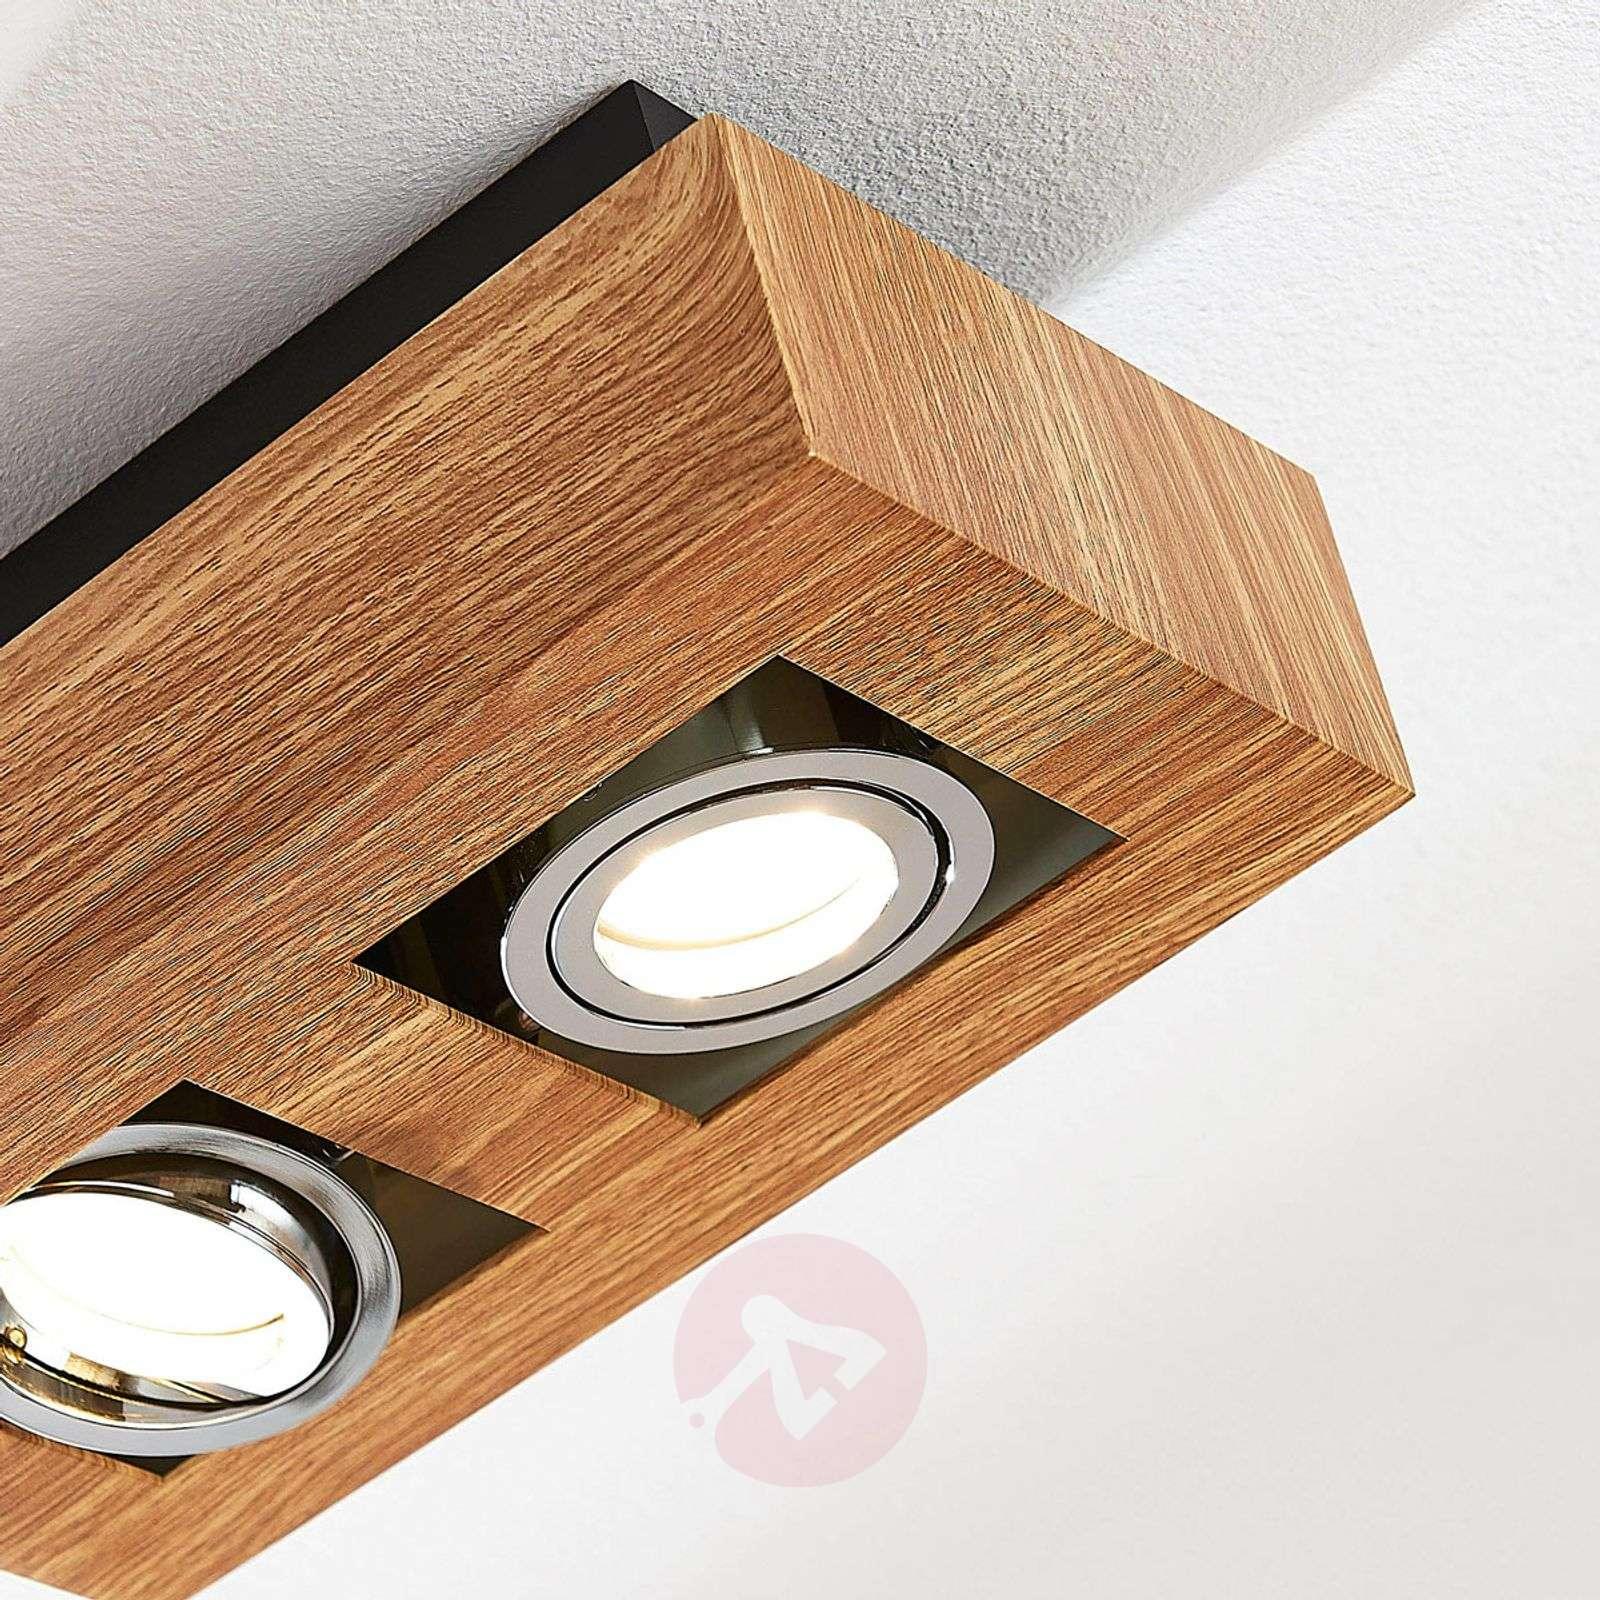 LED-kattolamppu Vince, 25 x 14 cm puuta-9621713-03